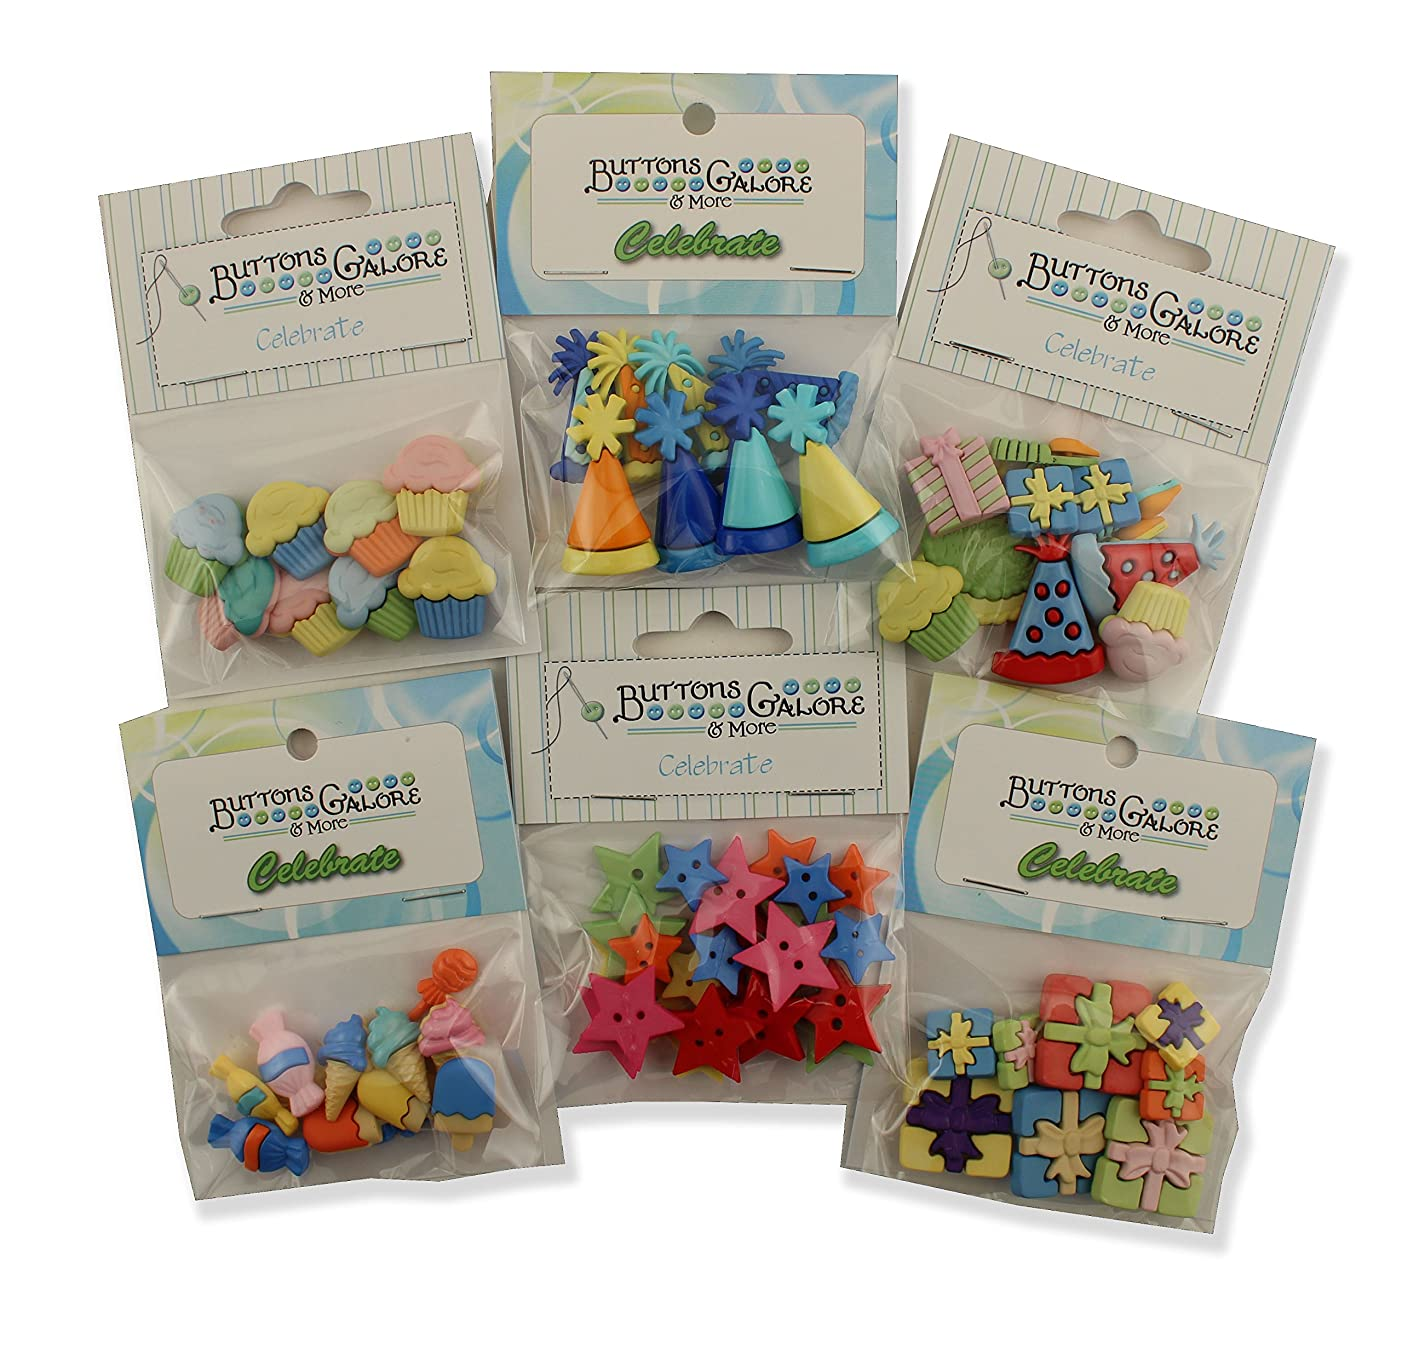 Buttons Galore CELEGRP1 FA121 Needle Arts, Multicolor